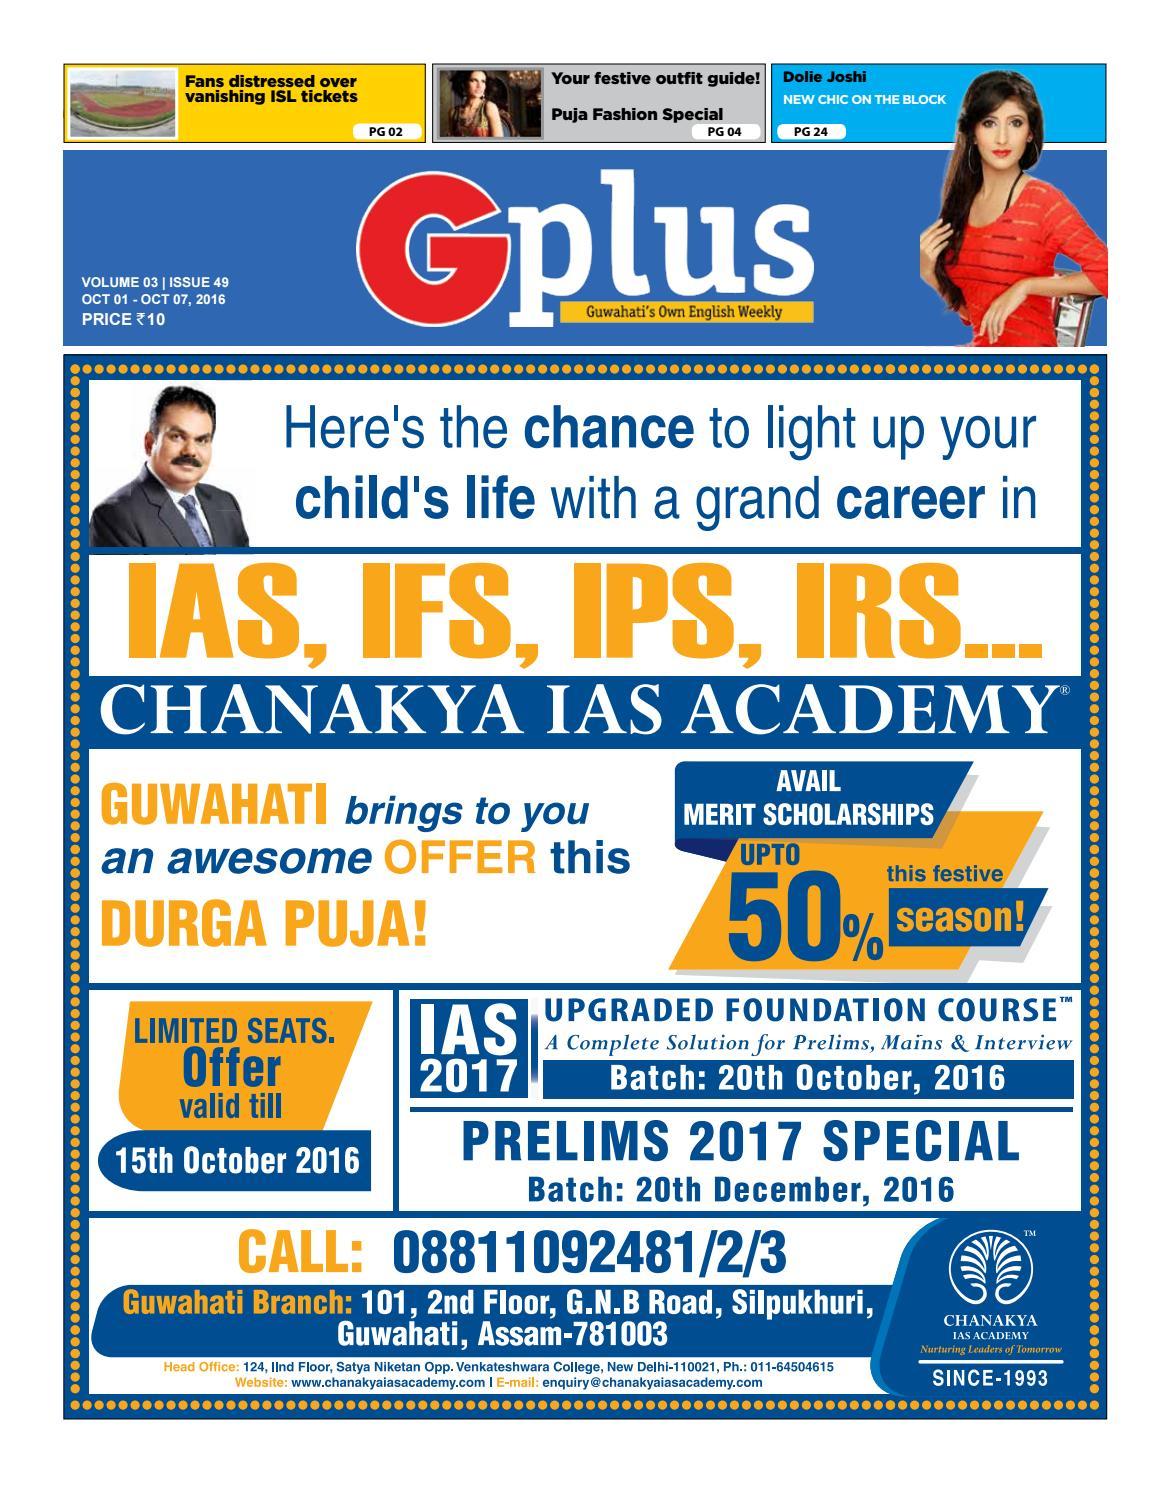 G Plus Vol 3 Issue 49 by G Plus - issuu